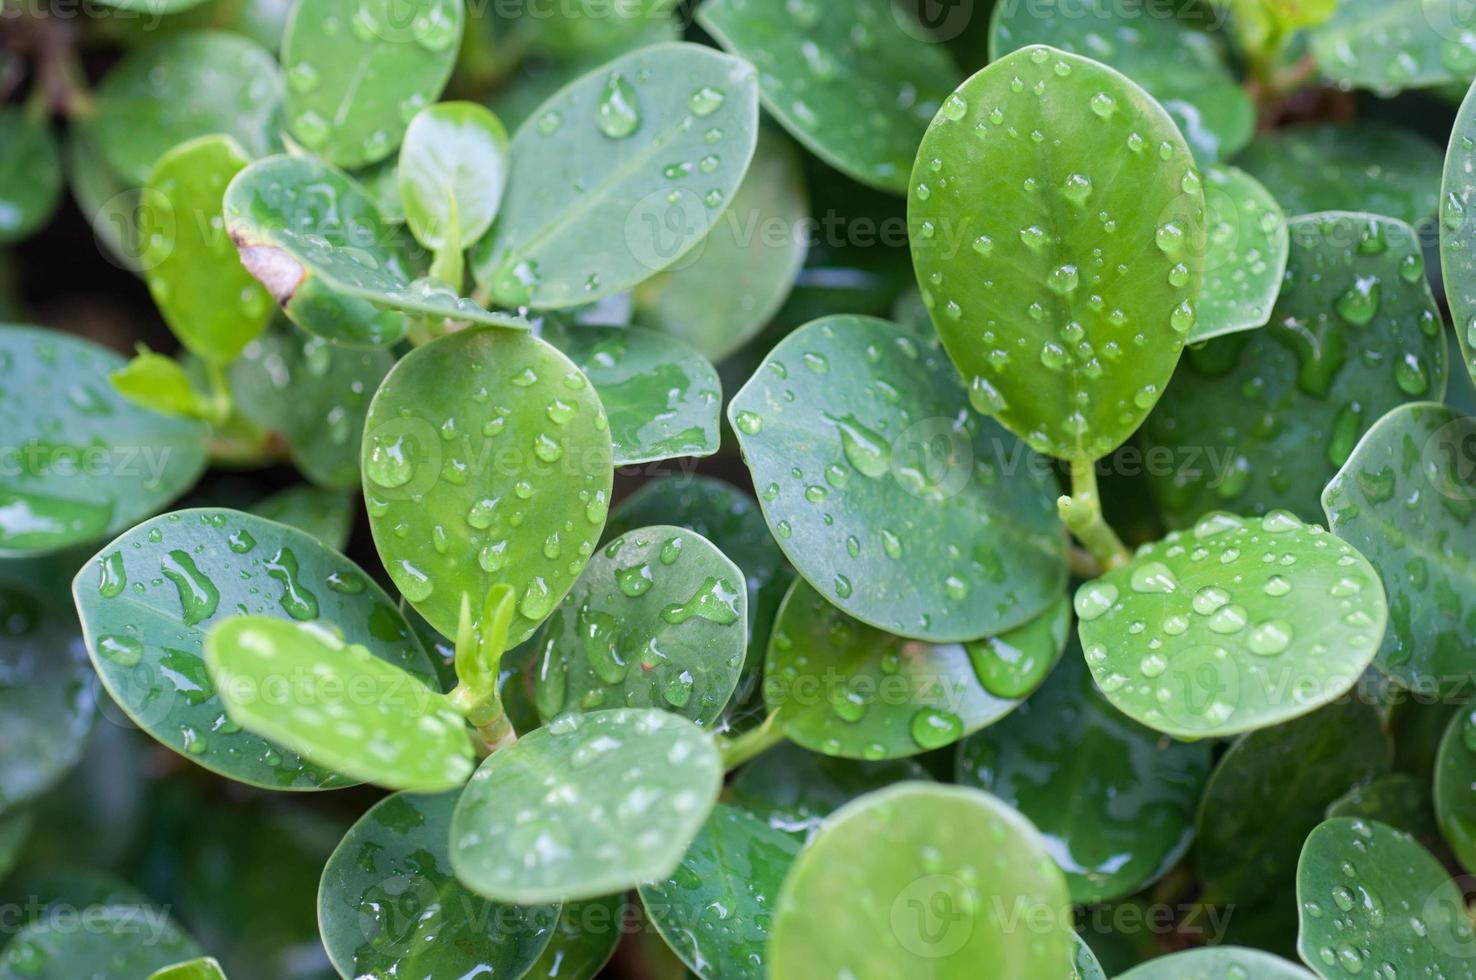 groen blad met waterdruppels foto